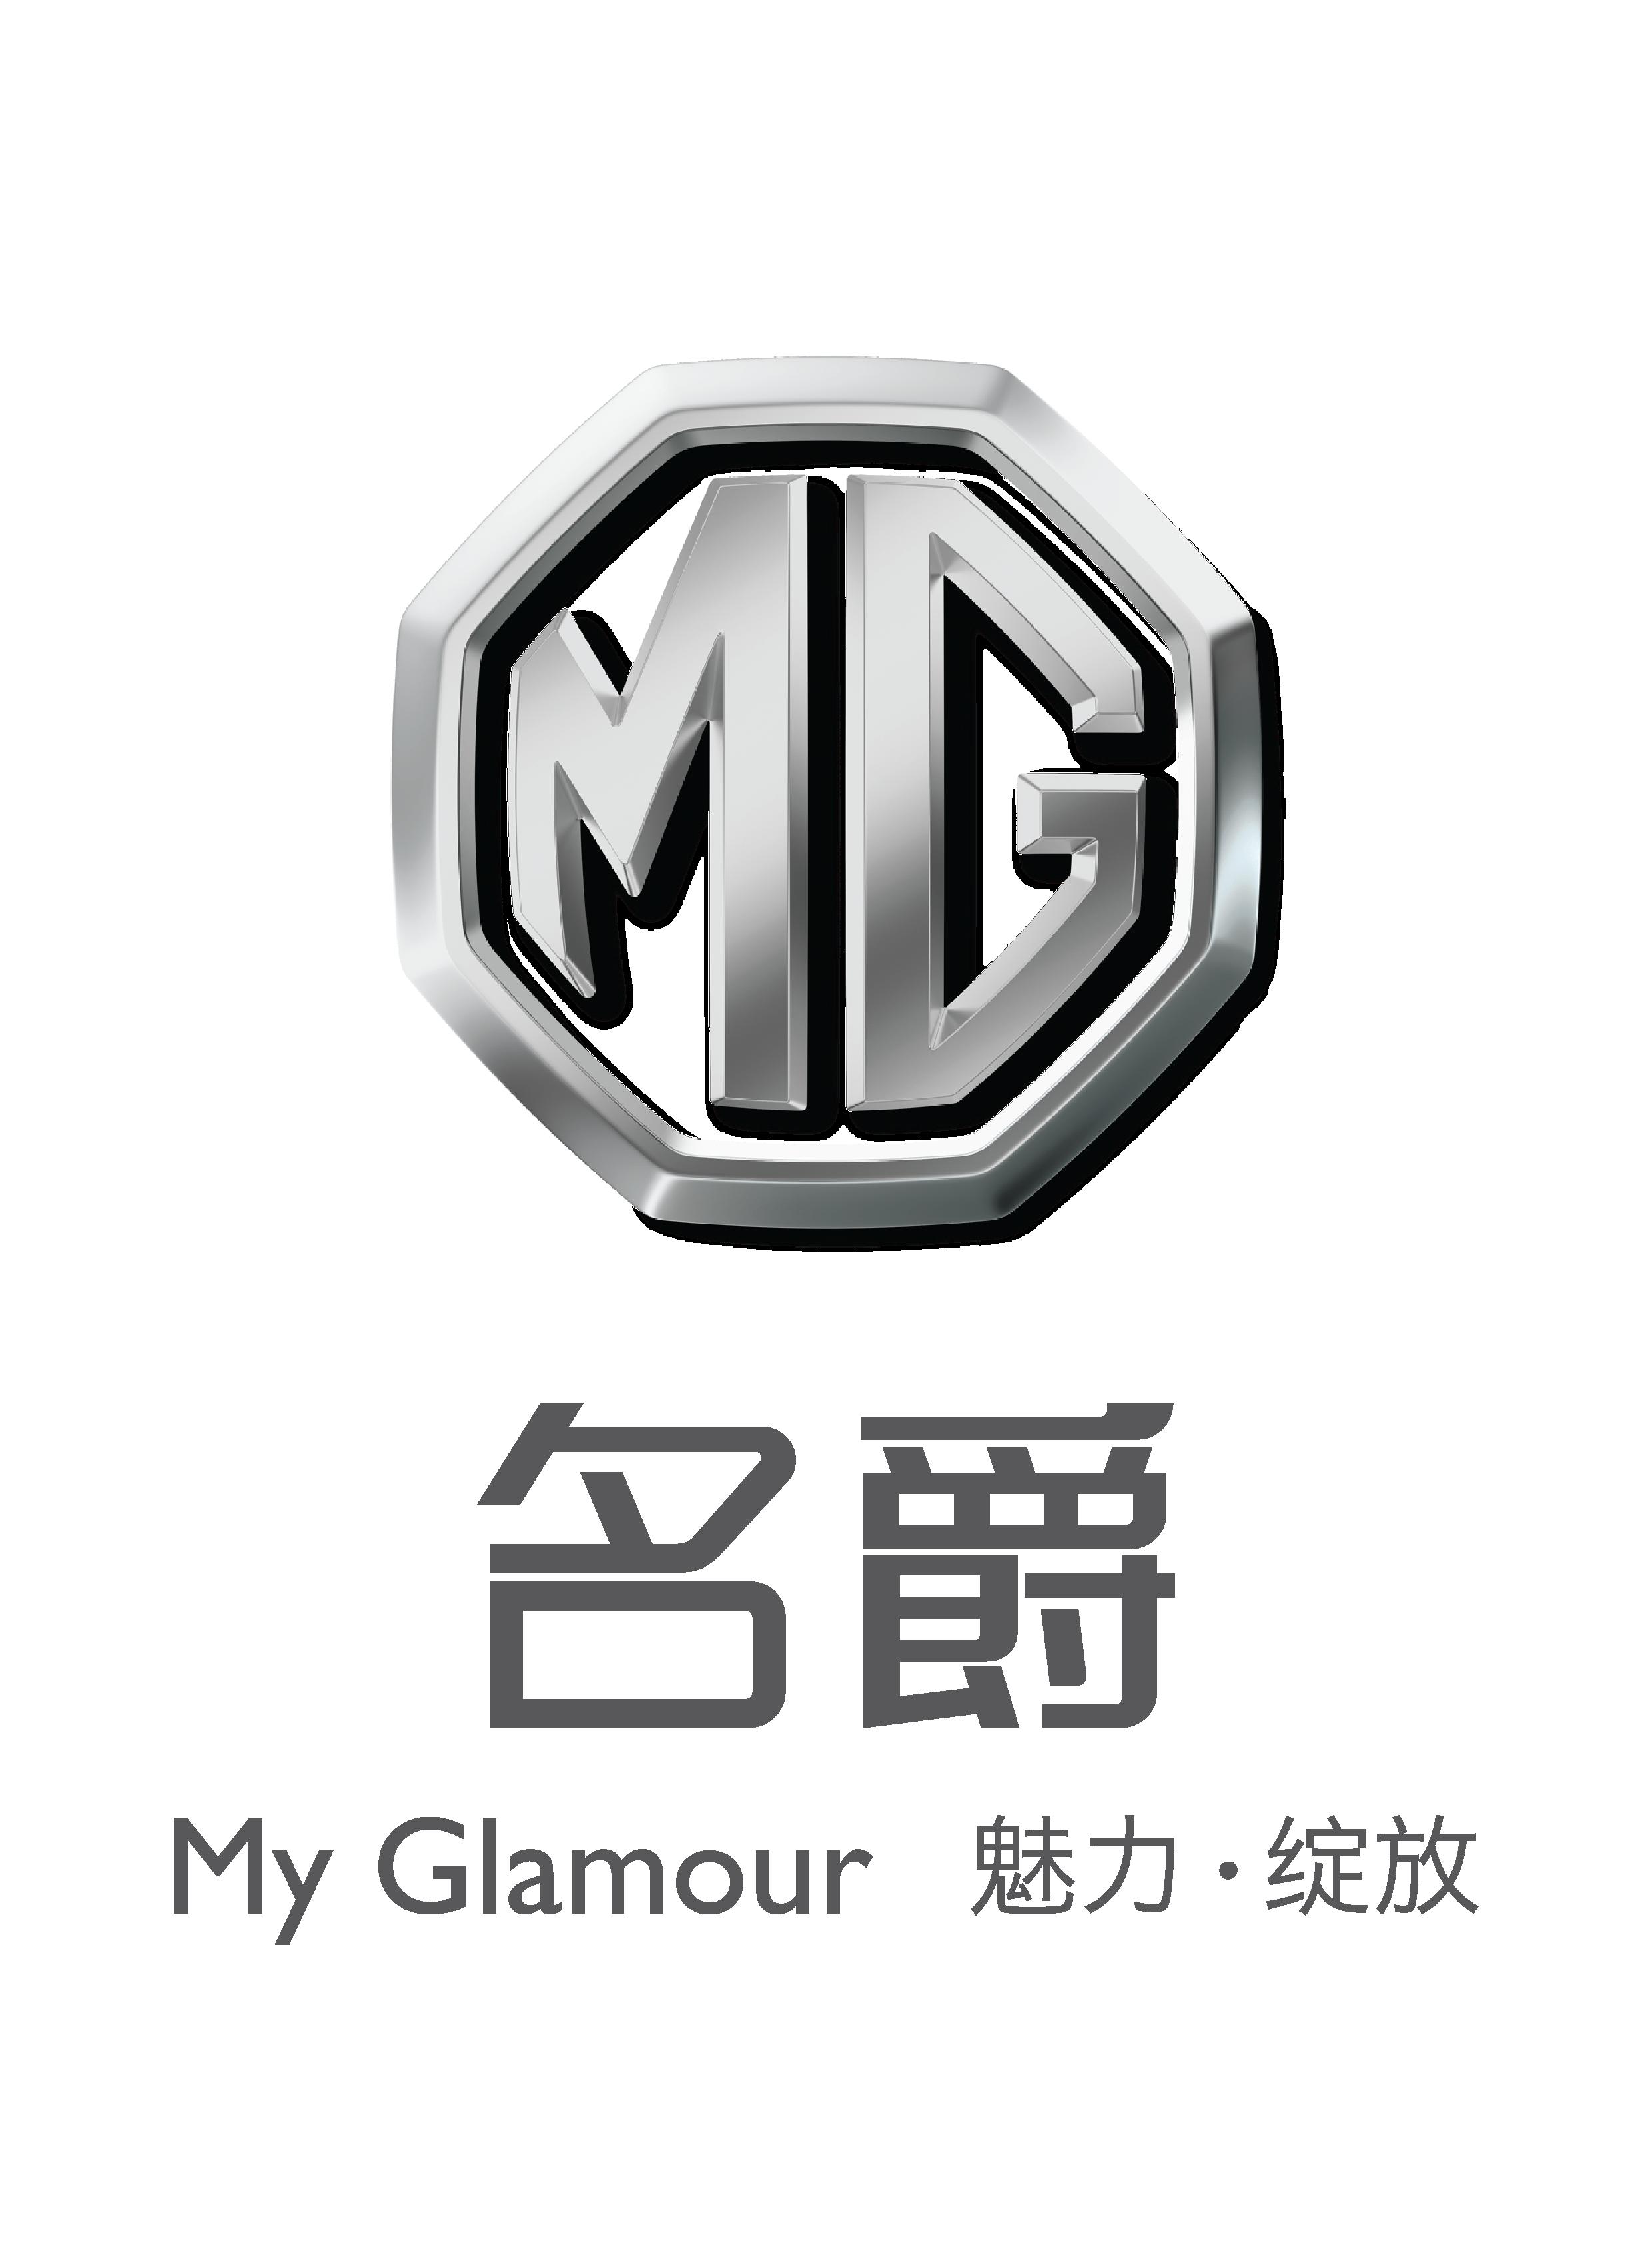 logo logo 标志 设计 图标 2480_3366 竖版 竖屏